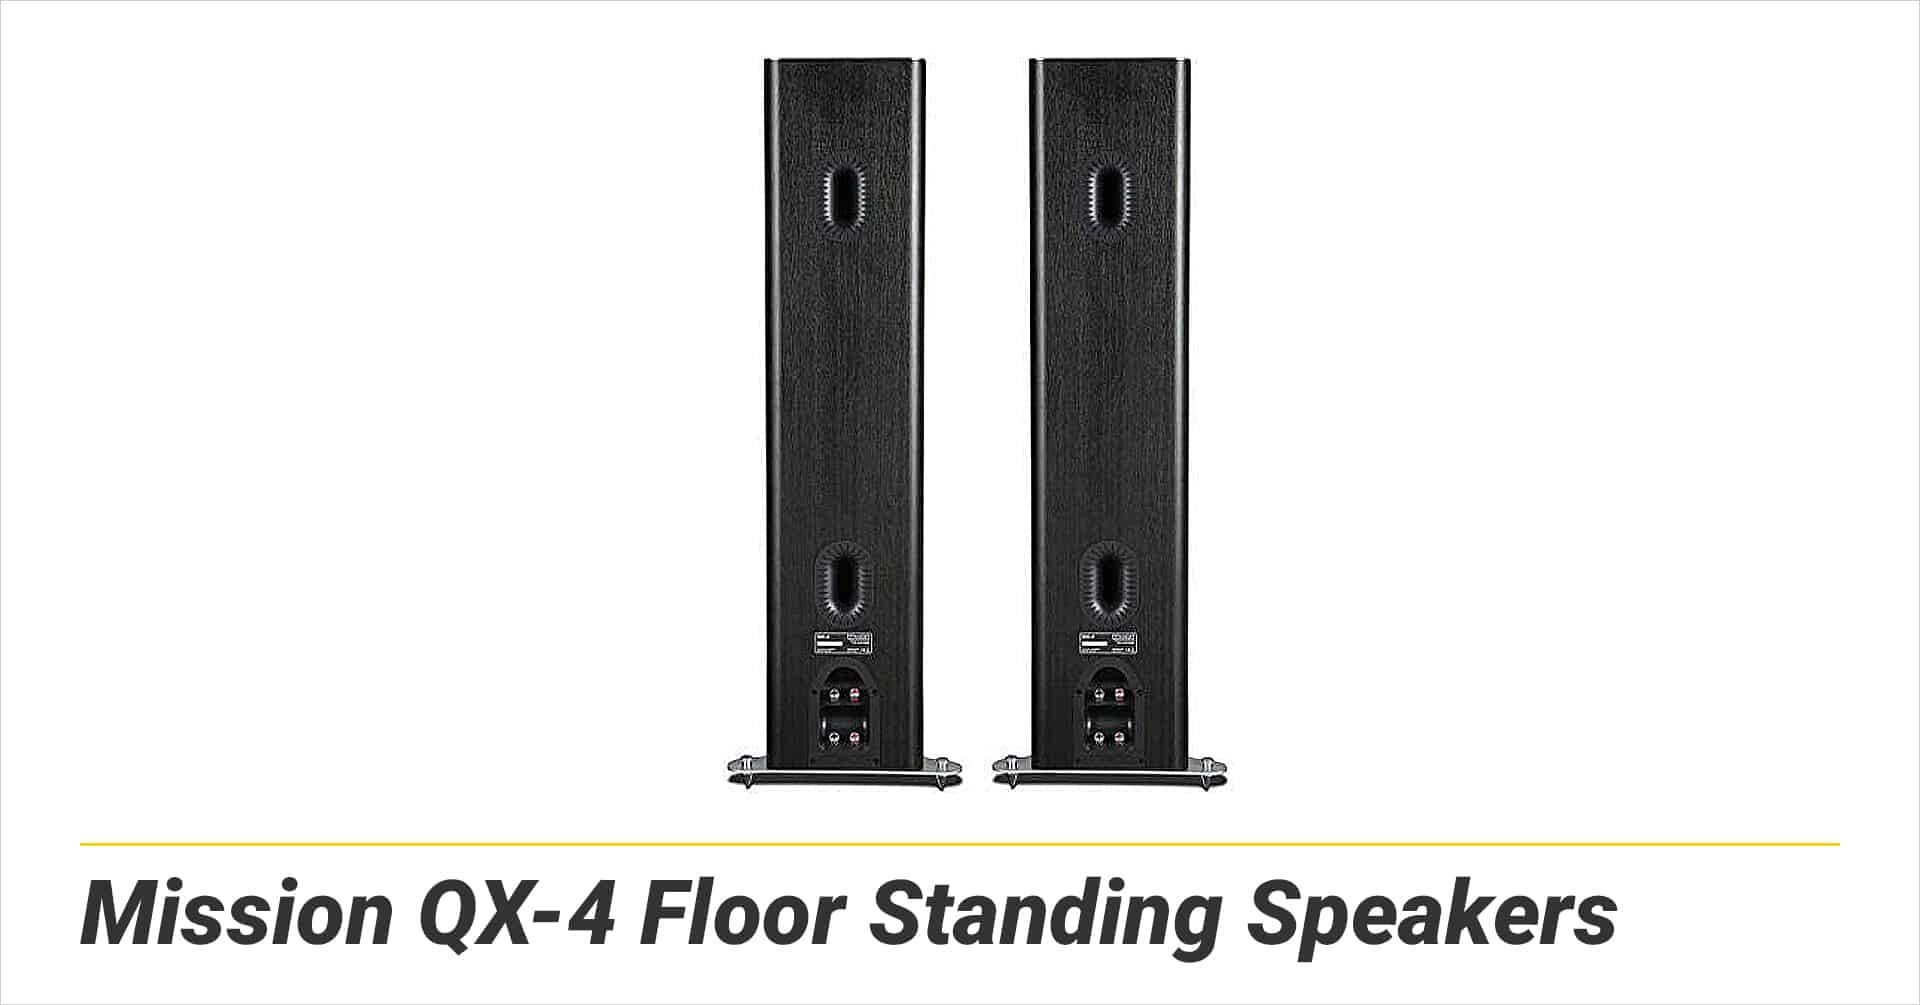 Mission QX-4 Floor Standing Speakers